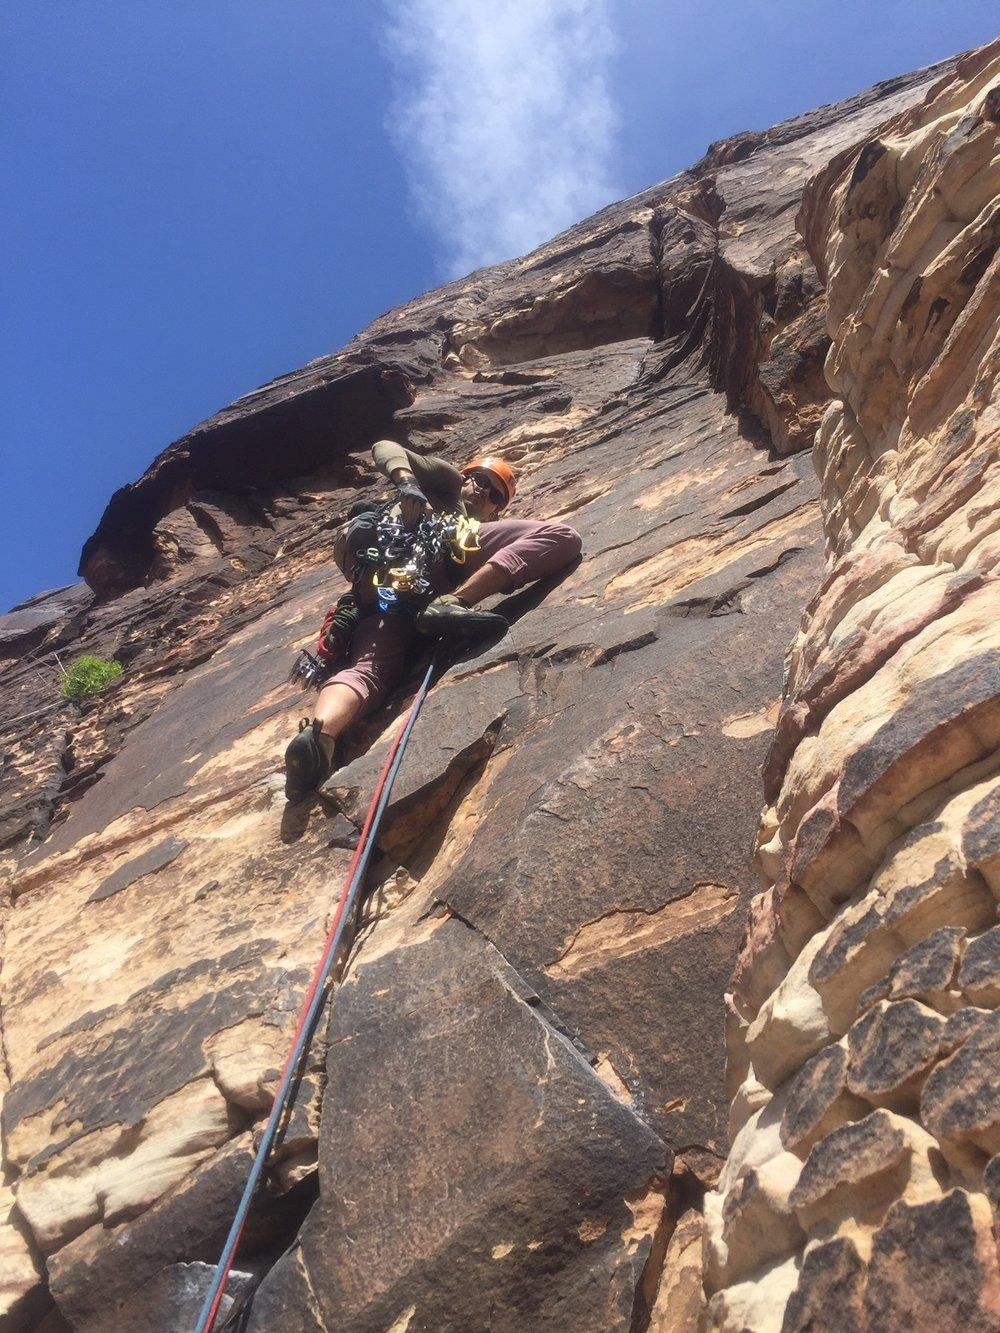 Red Rock Nevada Alpine Climber Rock Climbing SAANO Adventures Trad Climbing Multi Pitch.JPG